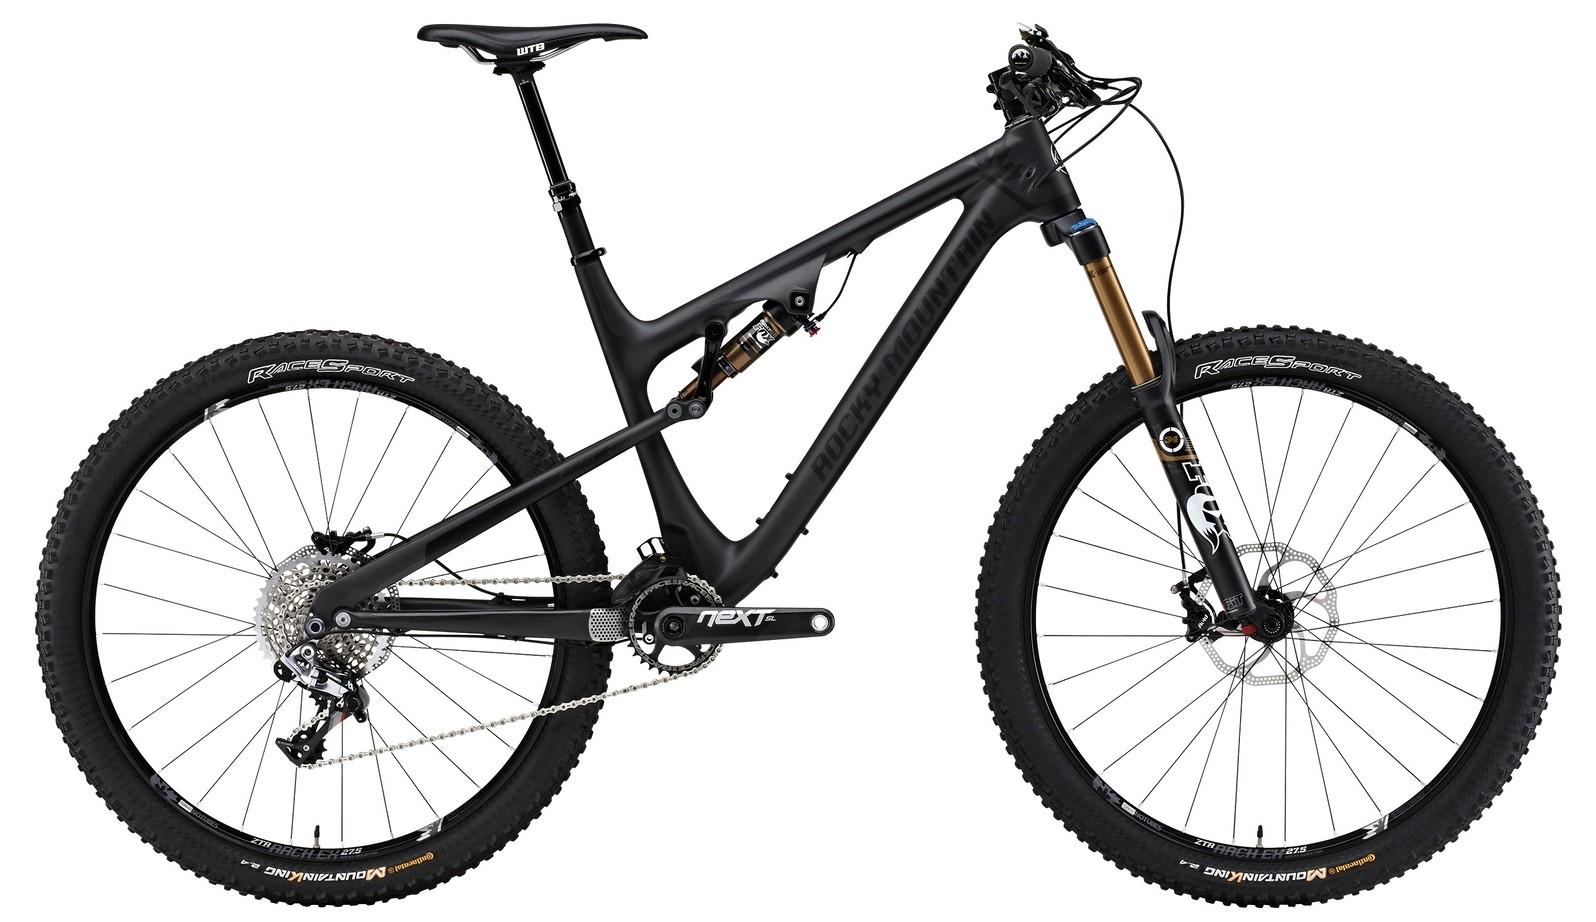 bike - 2014 Rocky Mountain Altitude 799 MSL